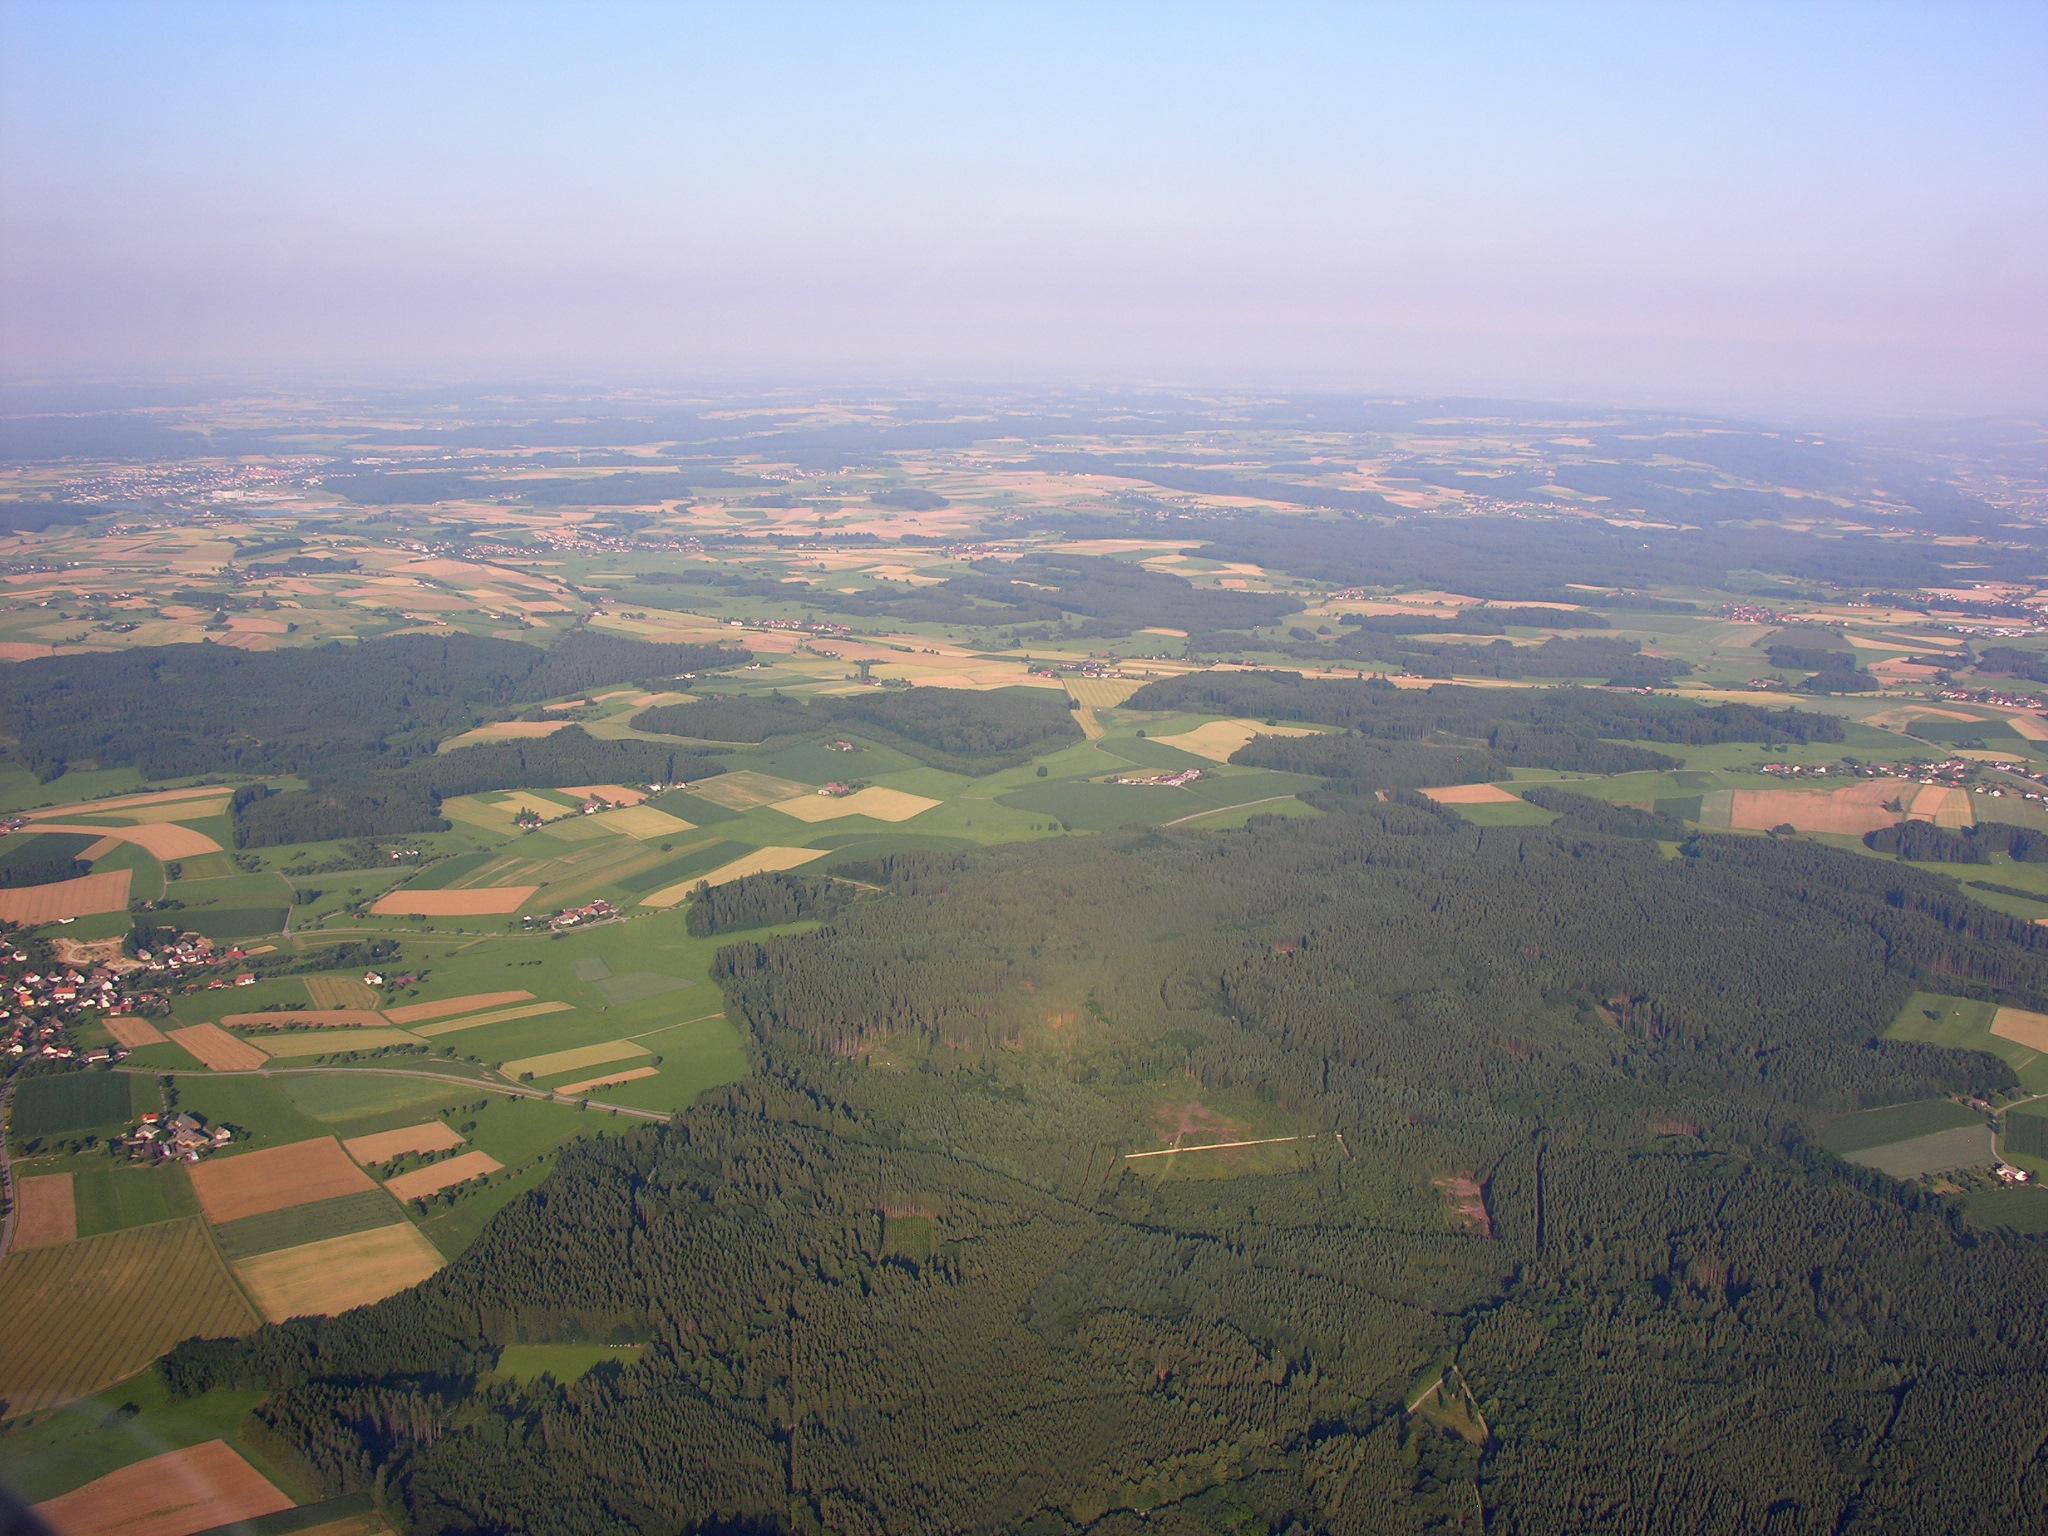 File Aerial View of Landscape near Sentenhart 15 07 2008